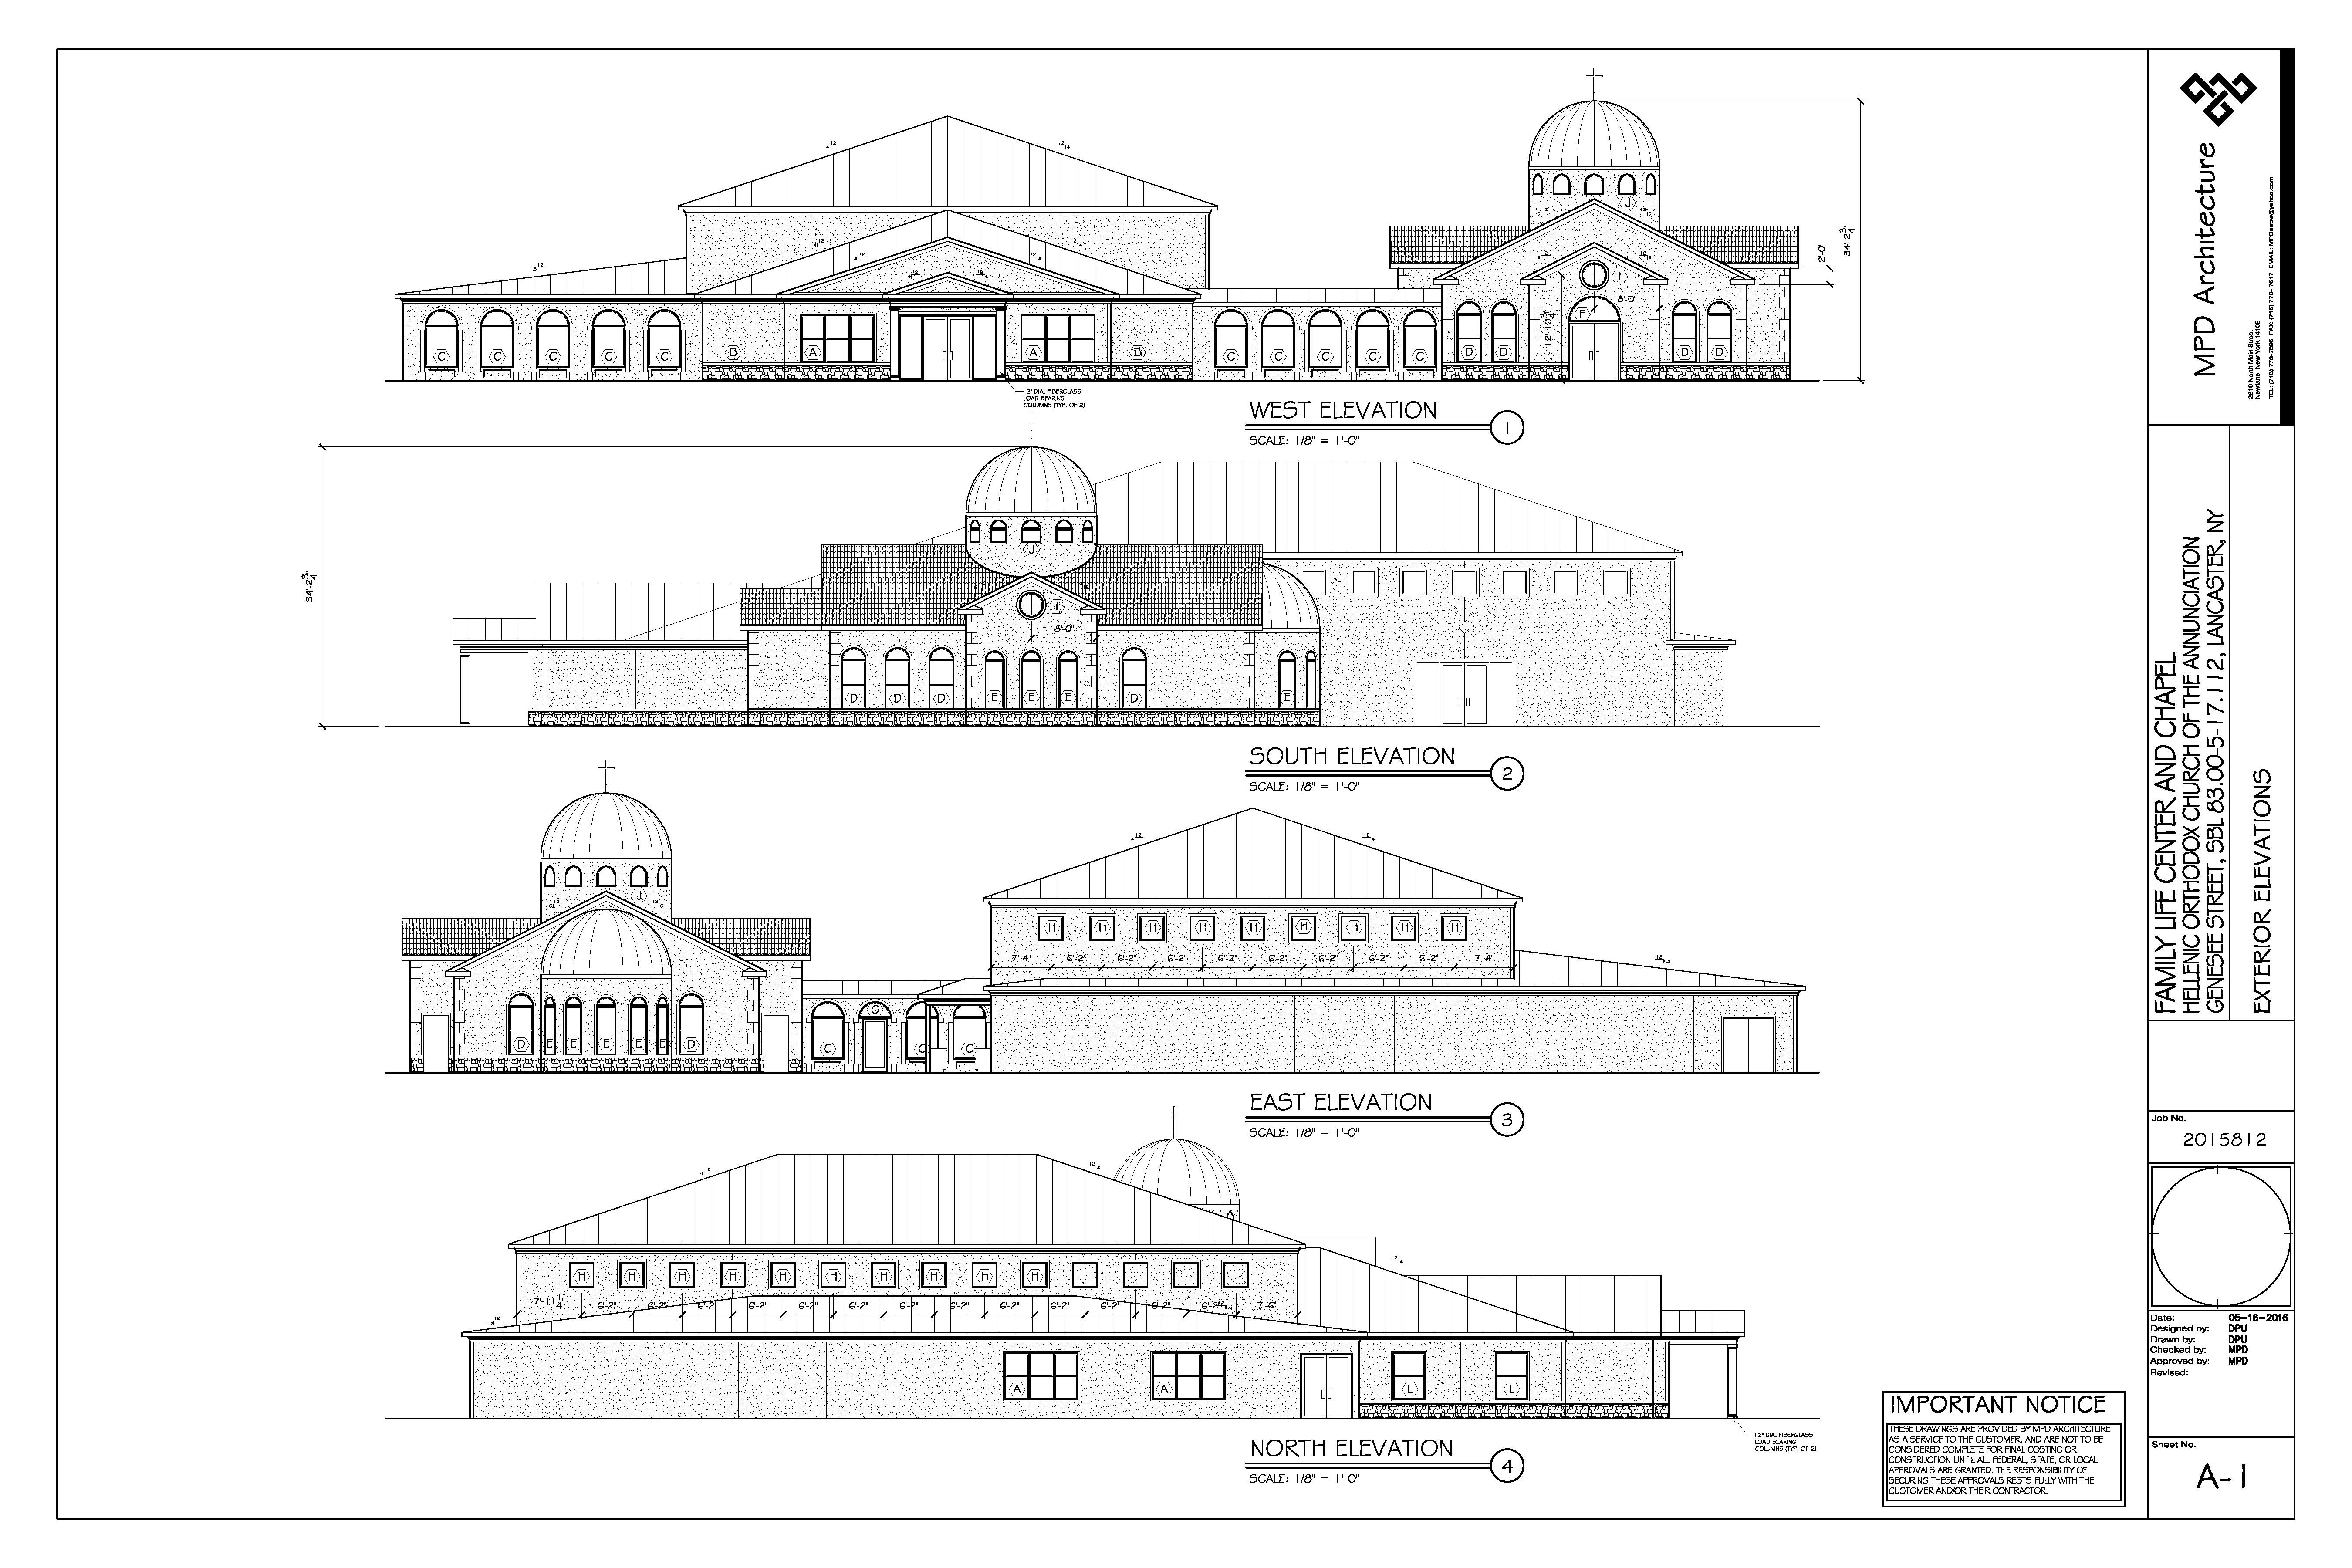 architectural plans annunciation greek orthodox church architectural plans